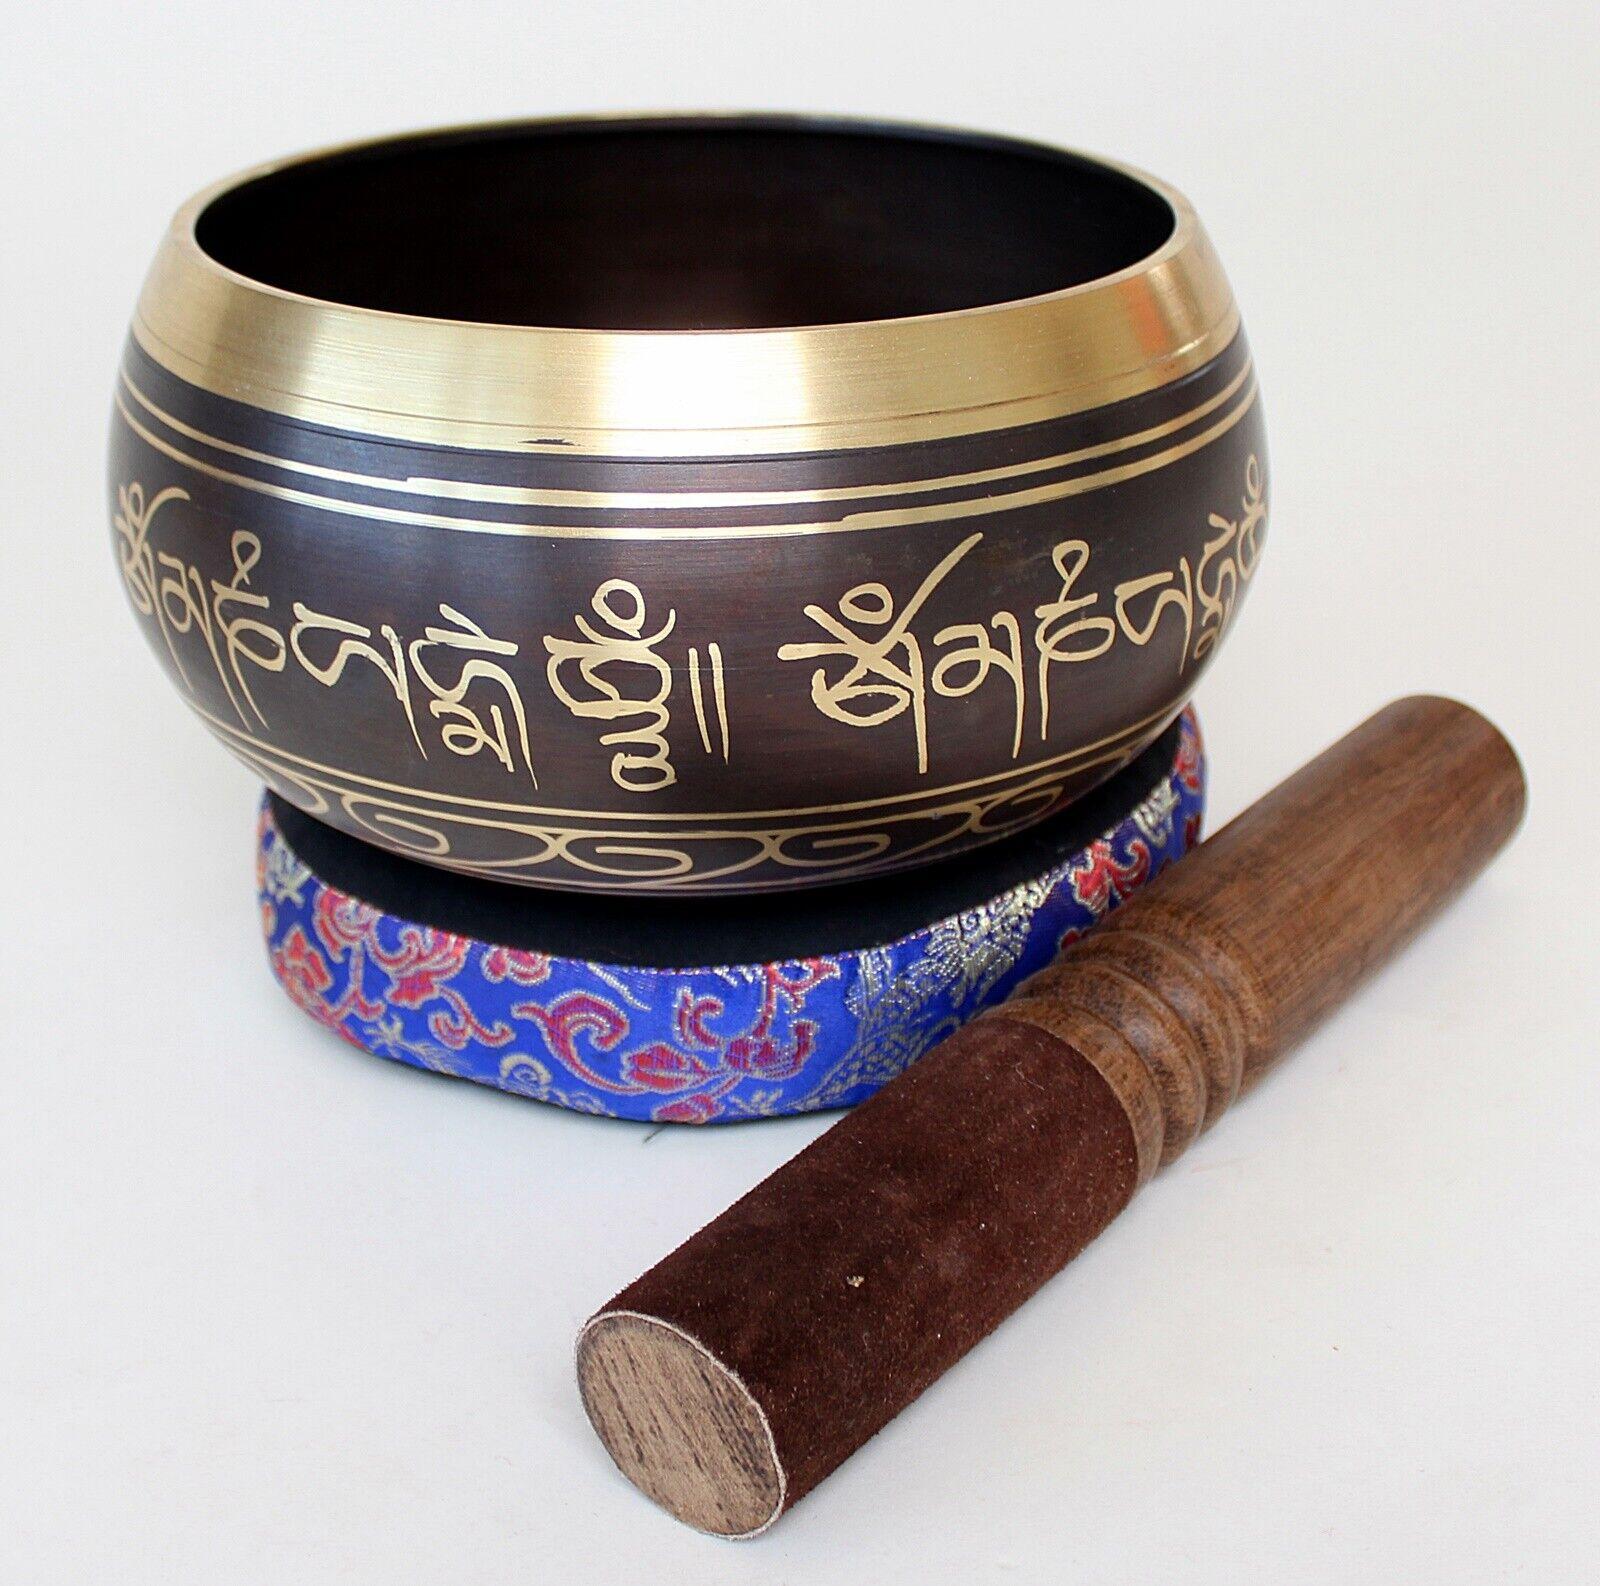 GEGOSSENE MIT 5 BUDDHAS VERZIERTE KLANGSCHALE 1,95 KG TON E MEDITATION YOGA